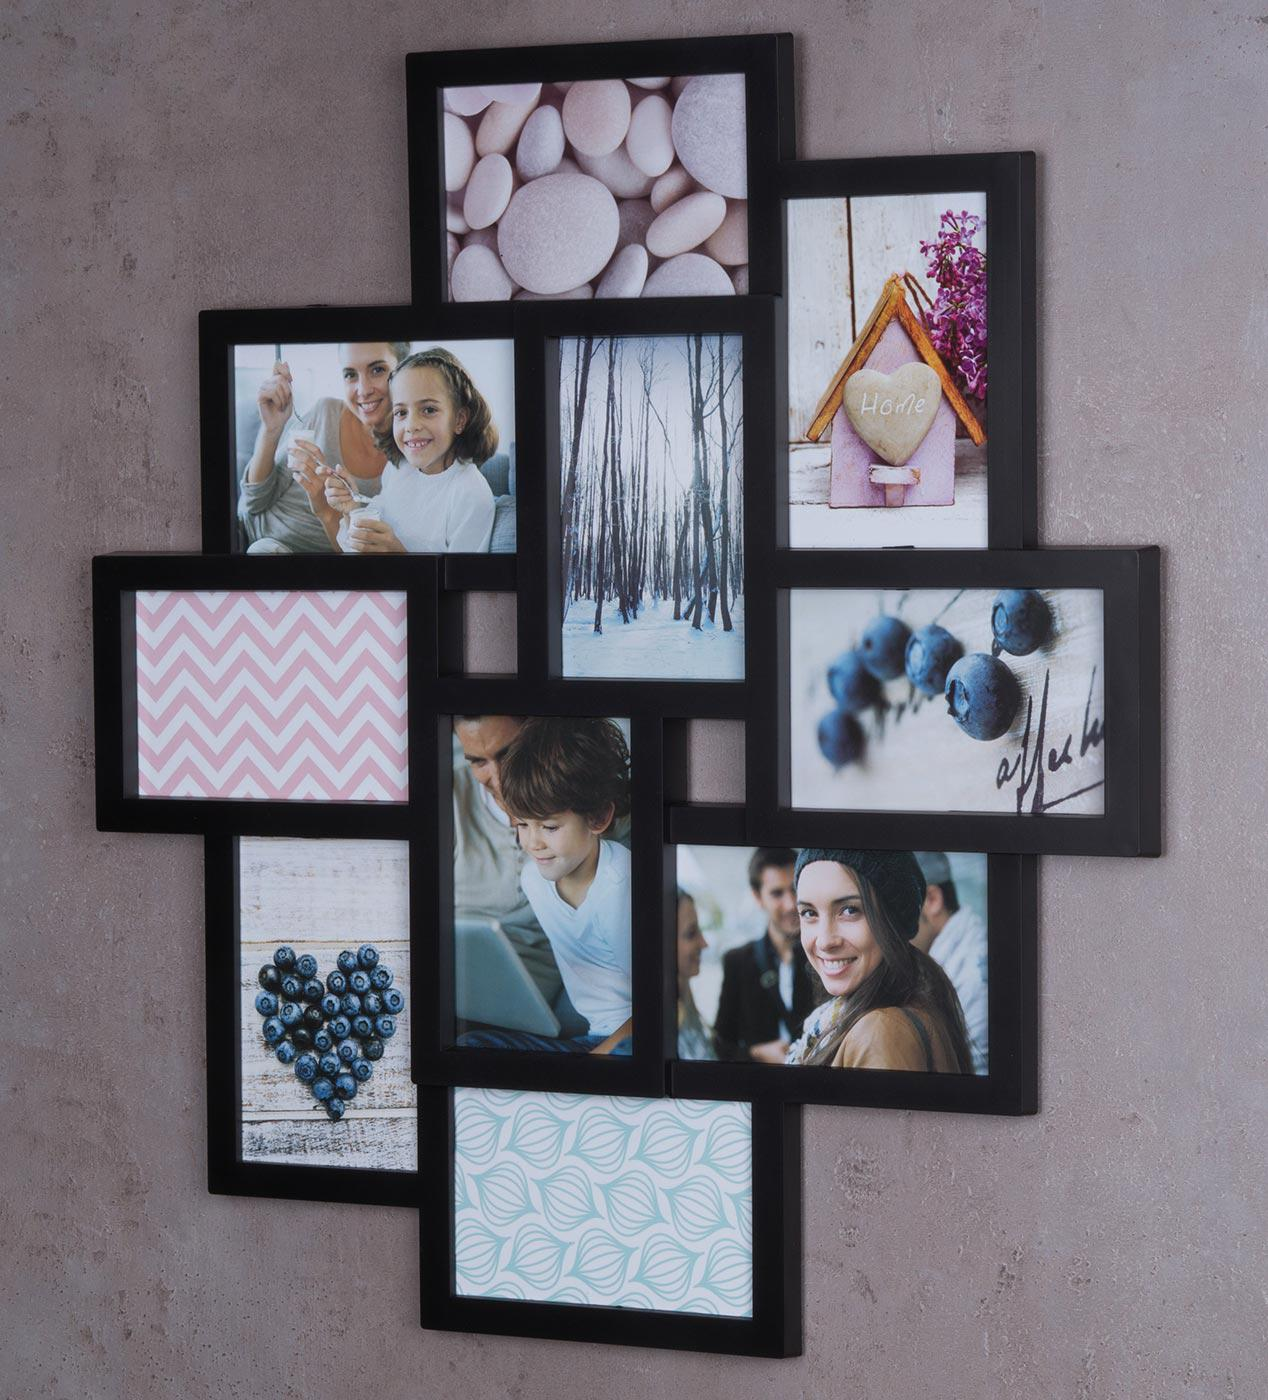 bilderrahmen schwarz 10 fotos fotogalerie fotocollage 3d optik collage kaufen bei living by design. Black Bedroom Furniture Sets. Home Design Ideas